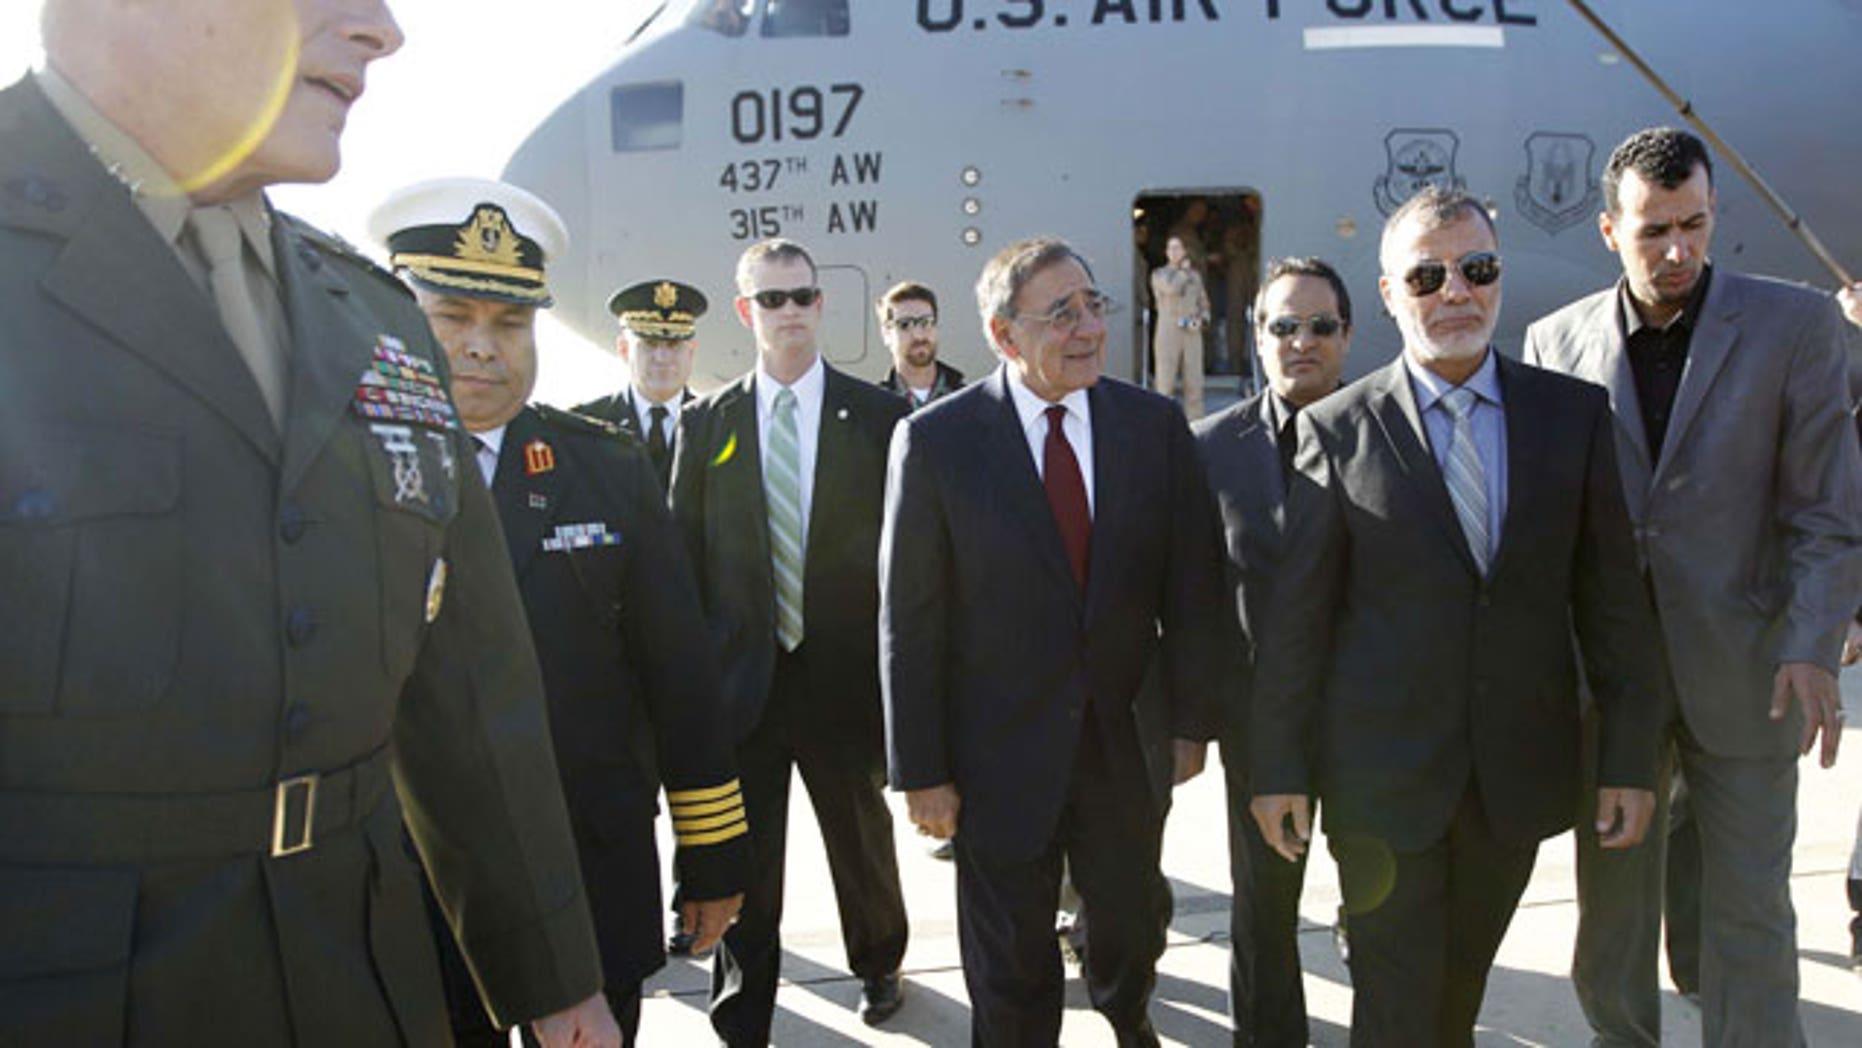 December 17, 2011: U.S. Sec. of Defense Leon Panetta walks across the tarmac during his arrival in Tripoli, Libya.